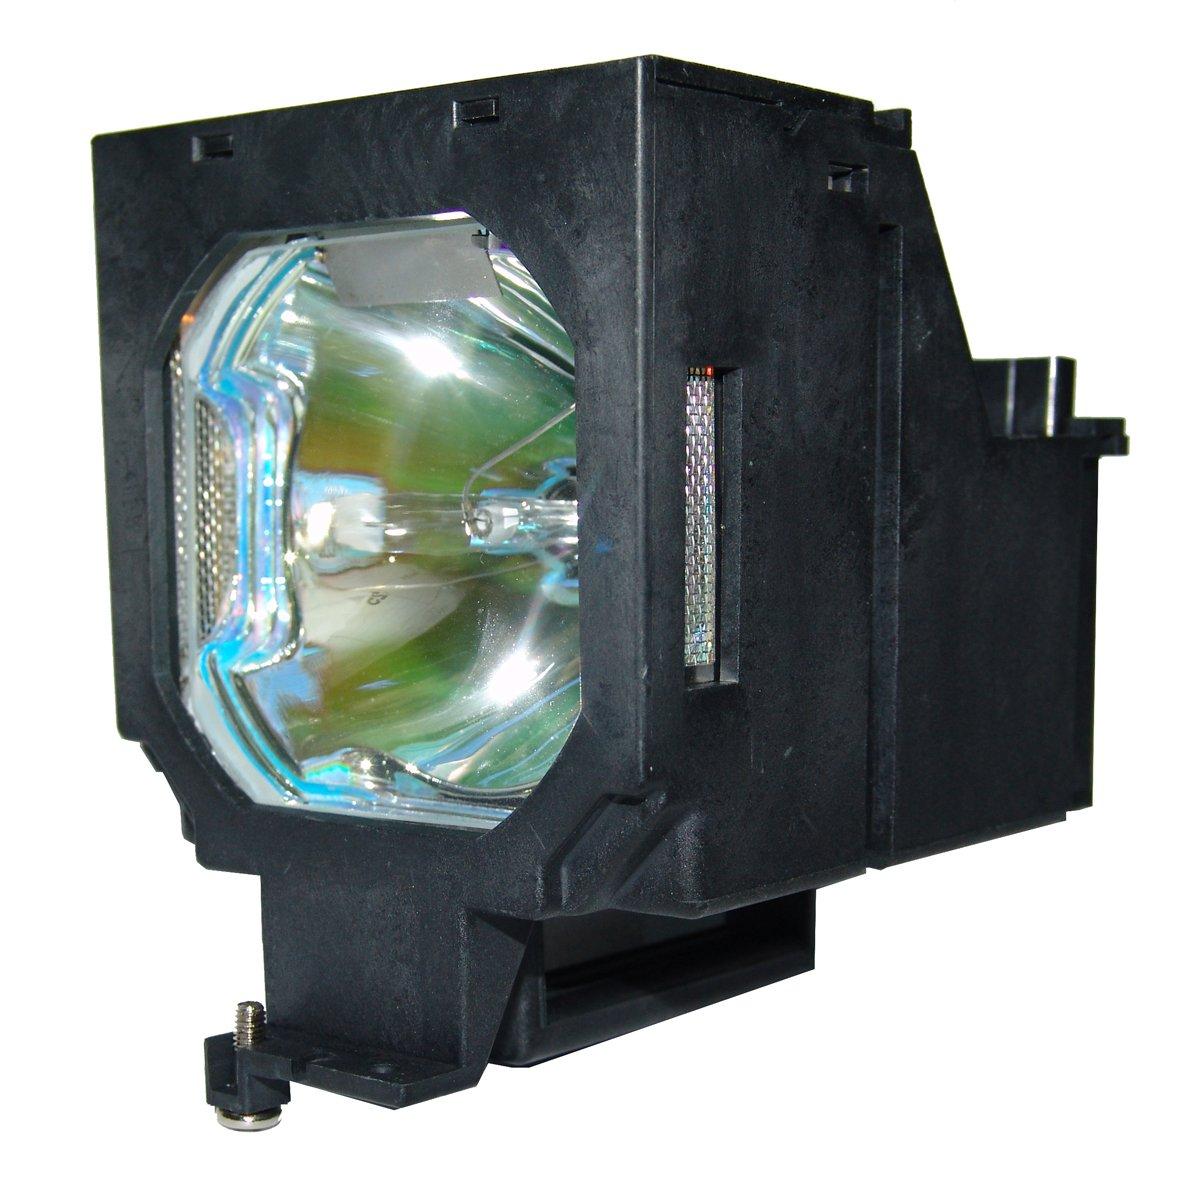 AuraBeam Professional Christie l2 K1500プロジェクタ用交換ランプハウジング( Powered by Ushio )   B01BG0JXM8